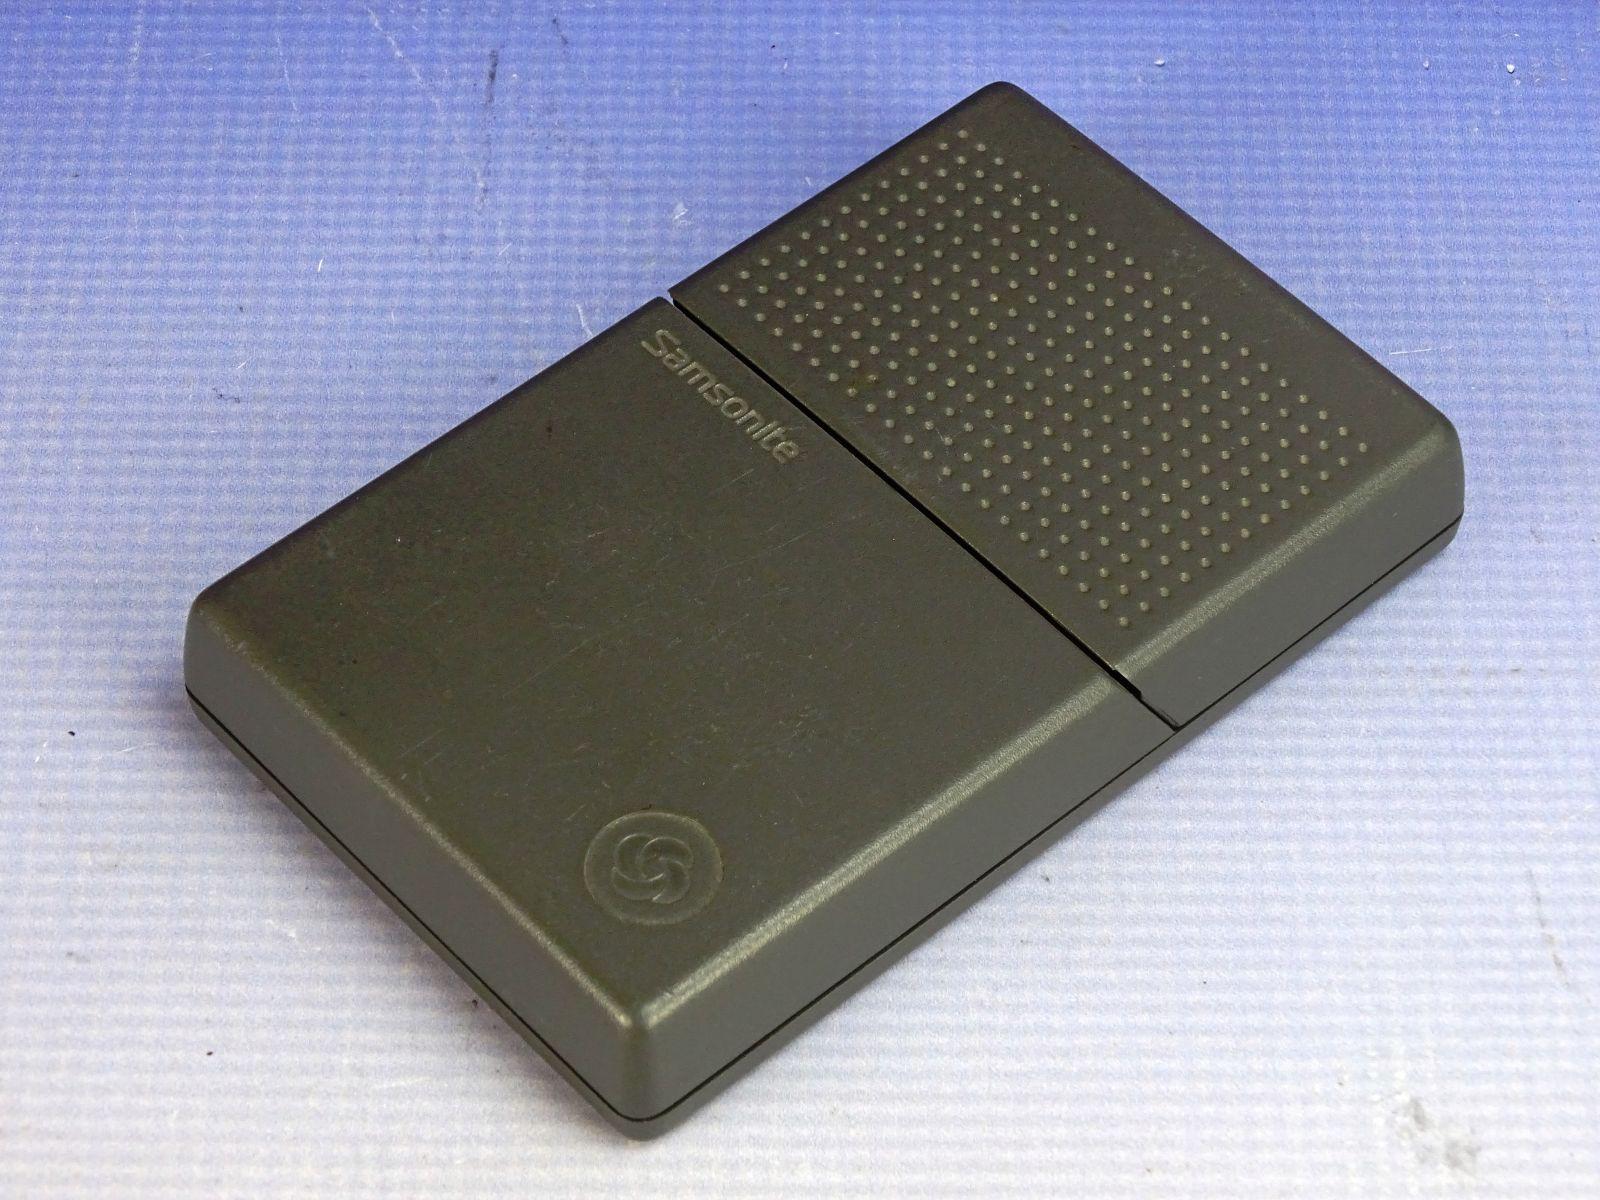 DSC02257.JPG (1600�1200)